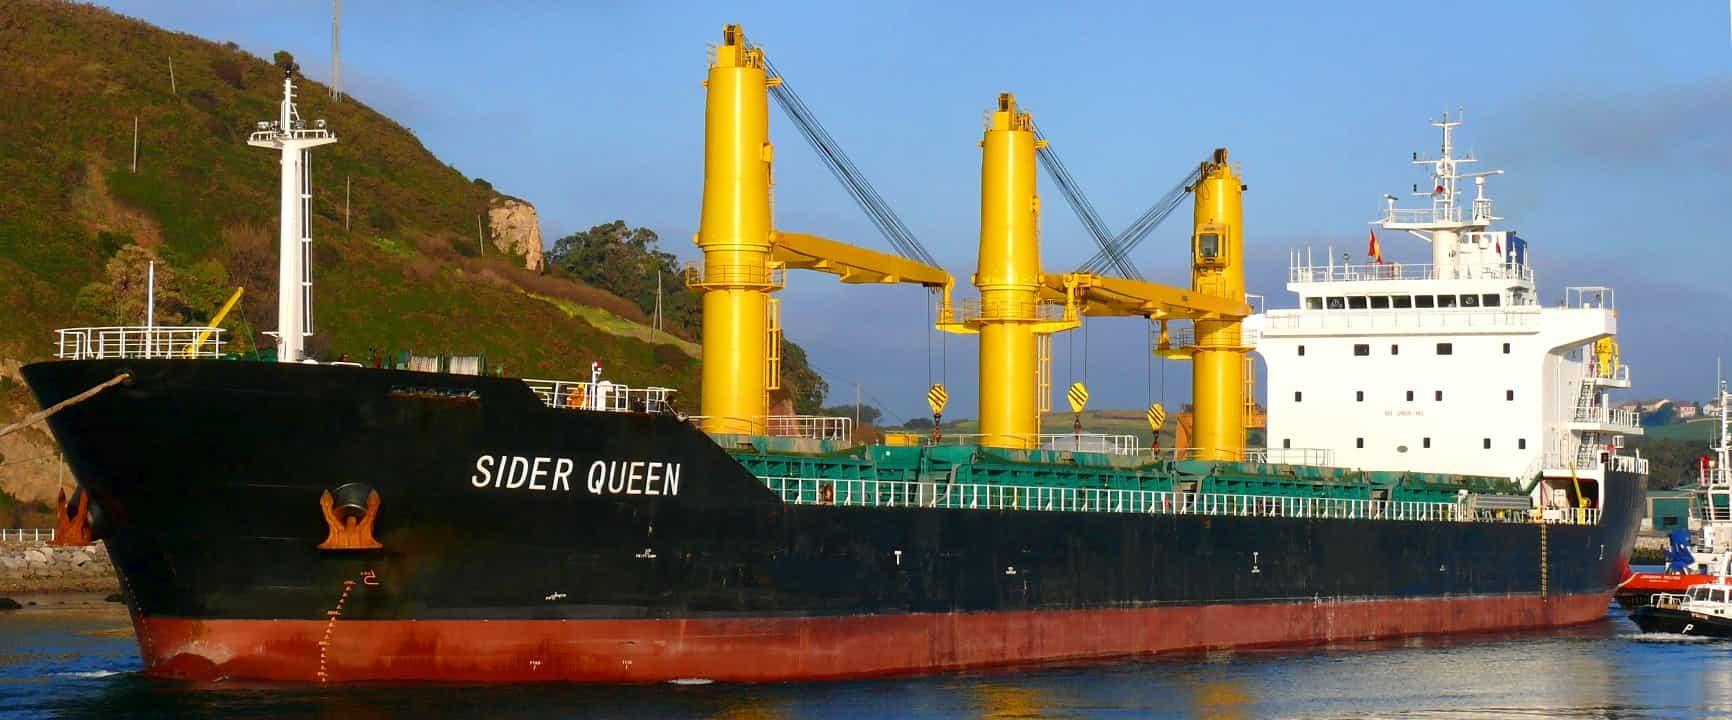 Home - Nova Marine Carriers